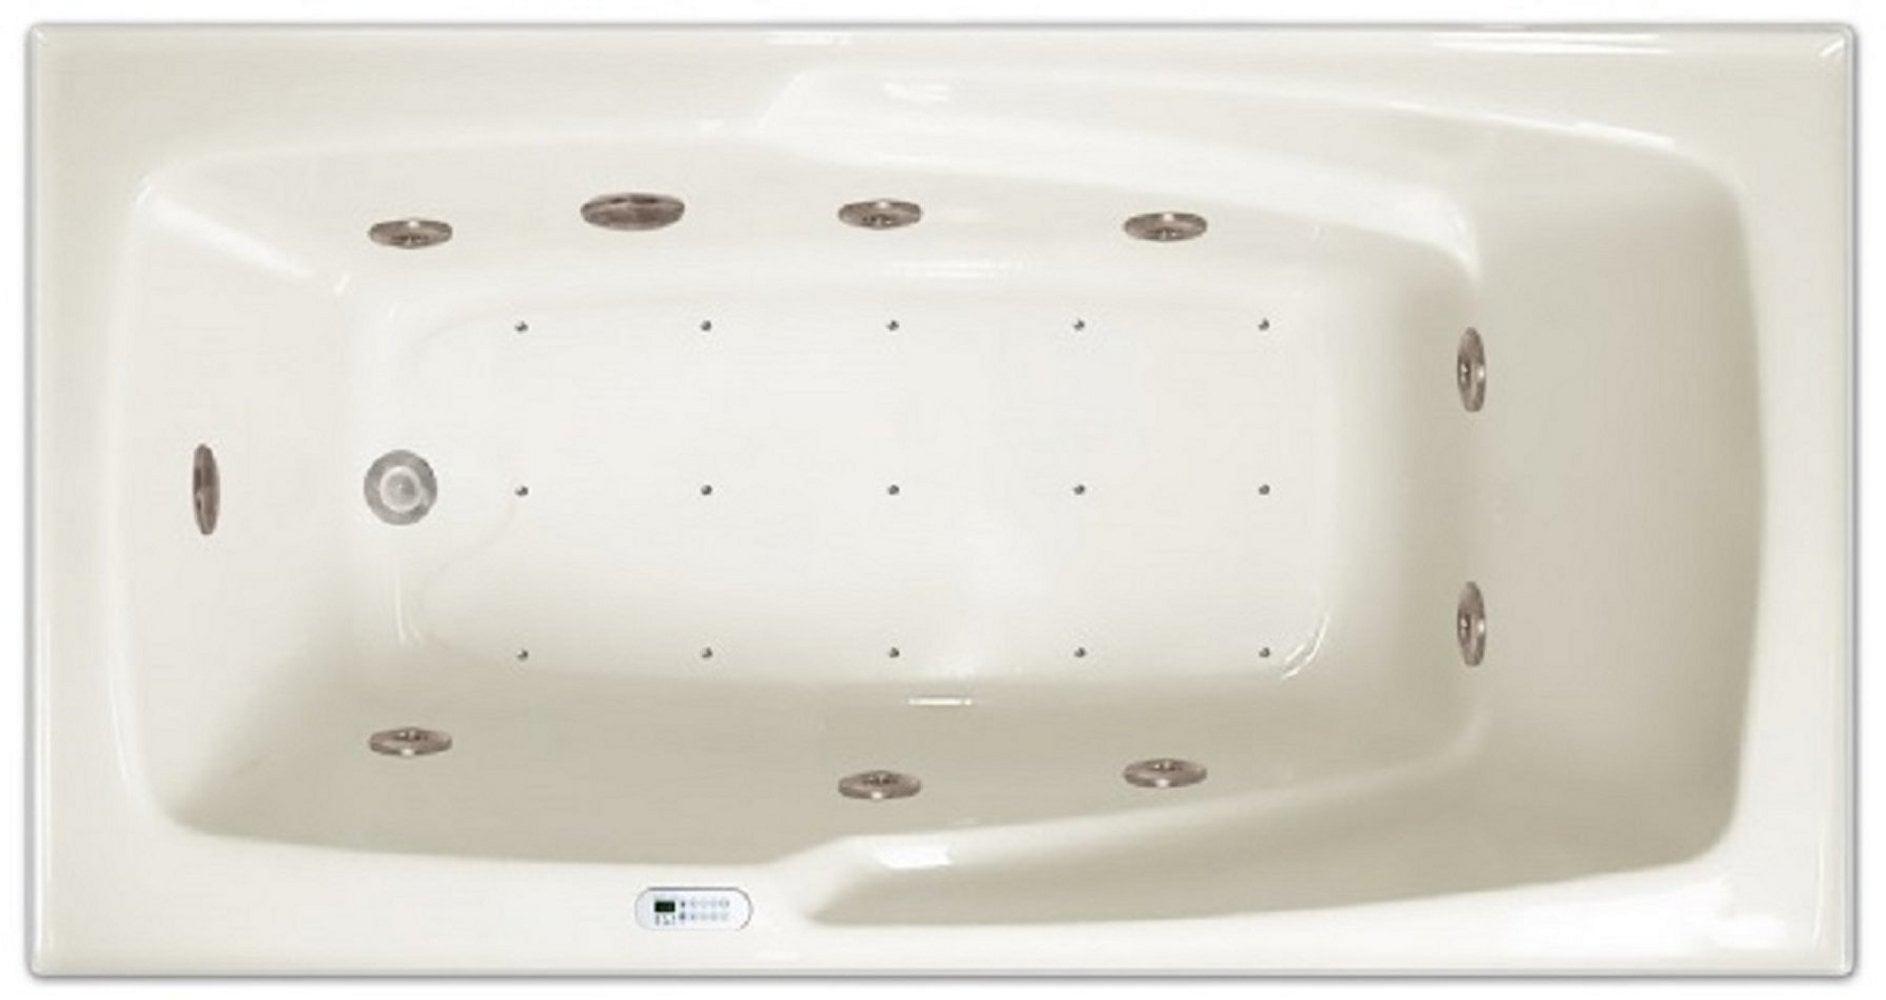 Drop-in Bathtub / 60x32x17.5 / high gloss white acrylic / Rectangle / LPI16-C-LD Pinnacle Bath - Air/Whirlpool Combo 0